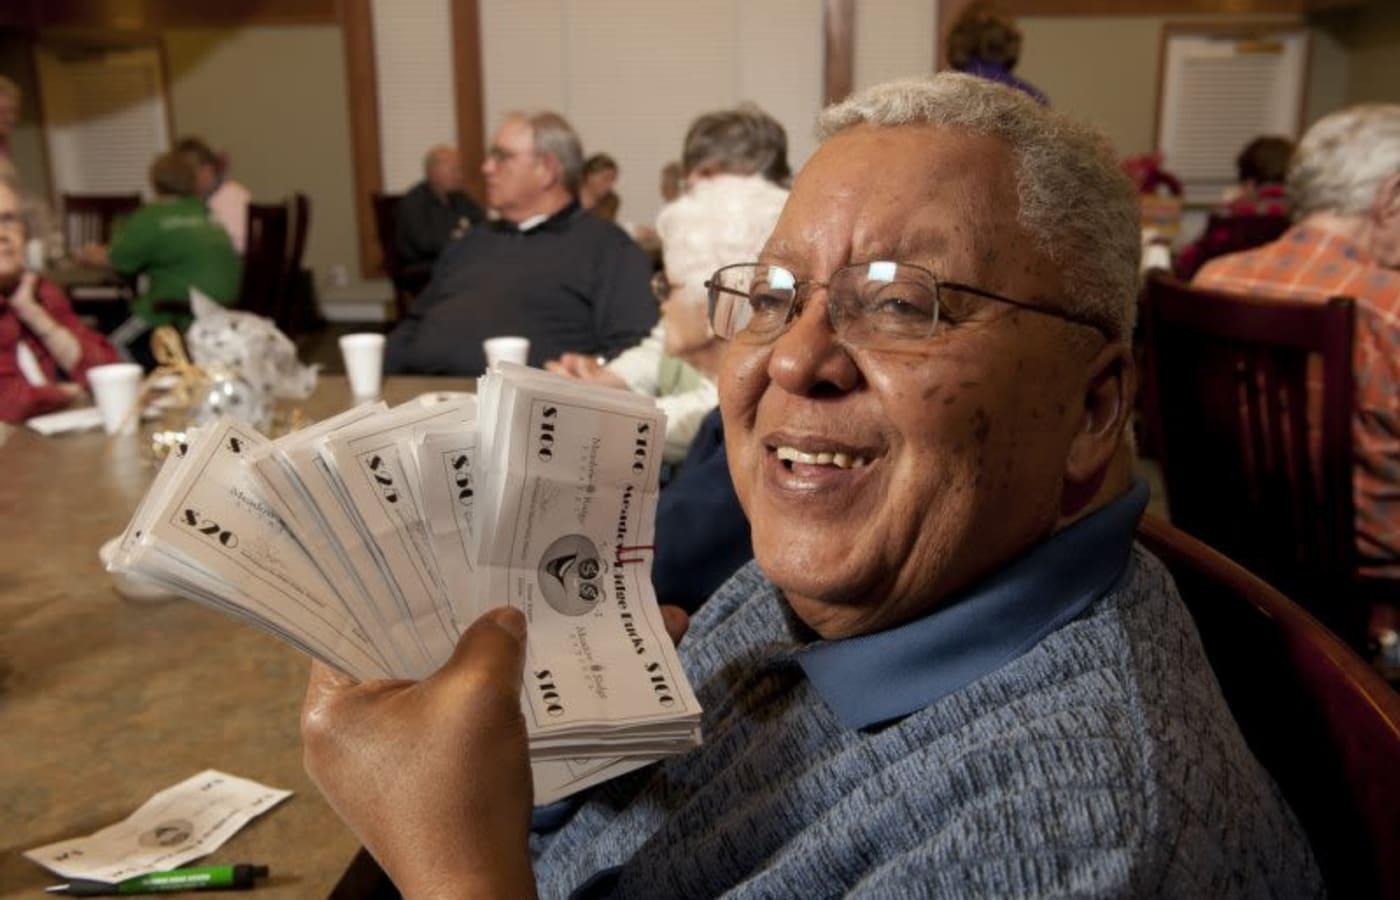 Meadow Ridge Senior Living resident enjoying some of our social activities